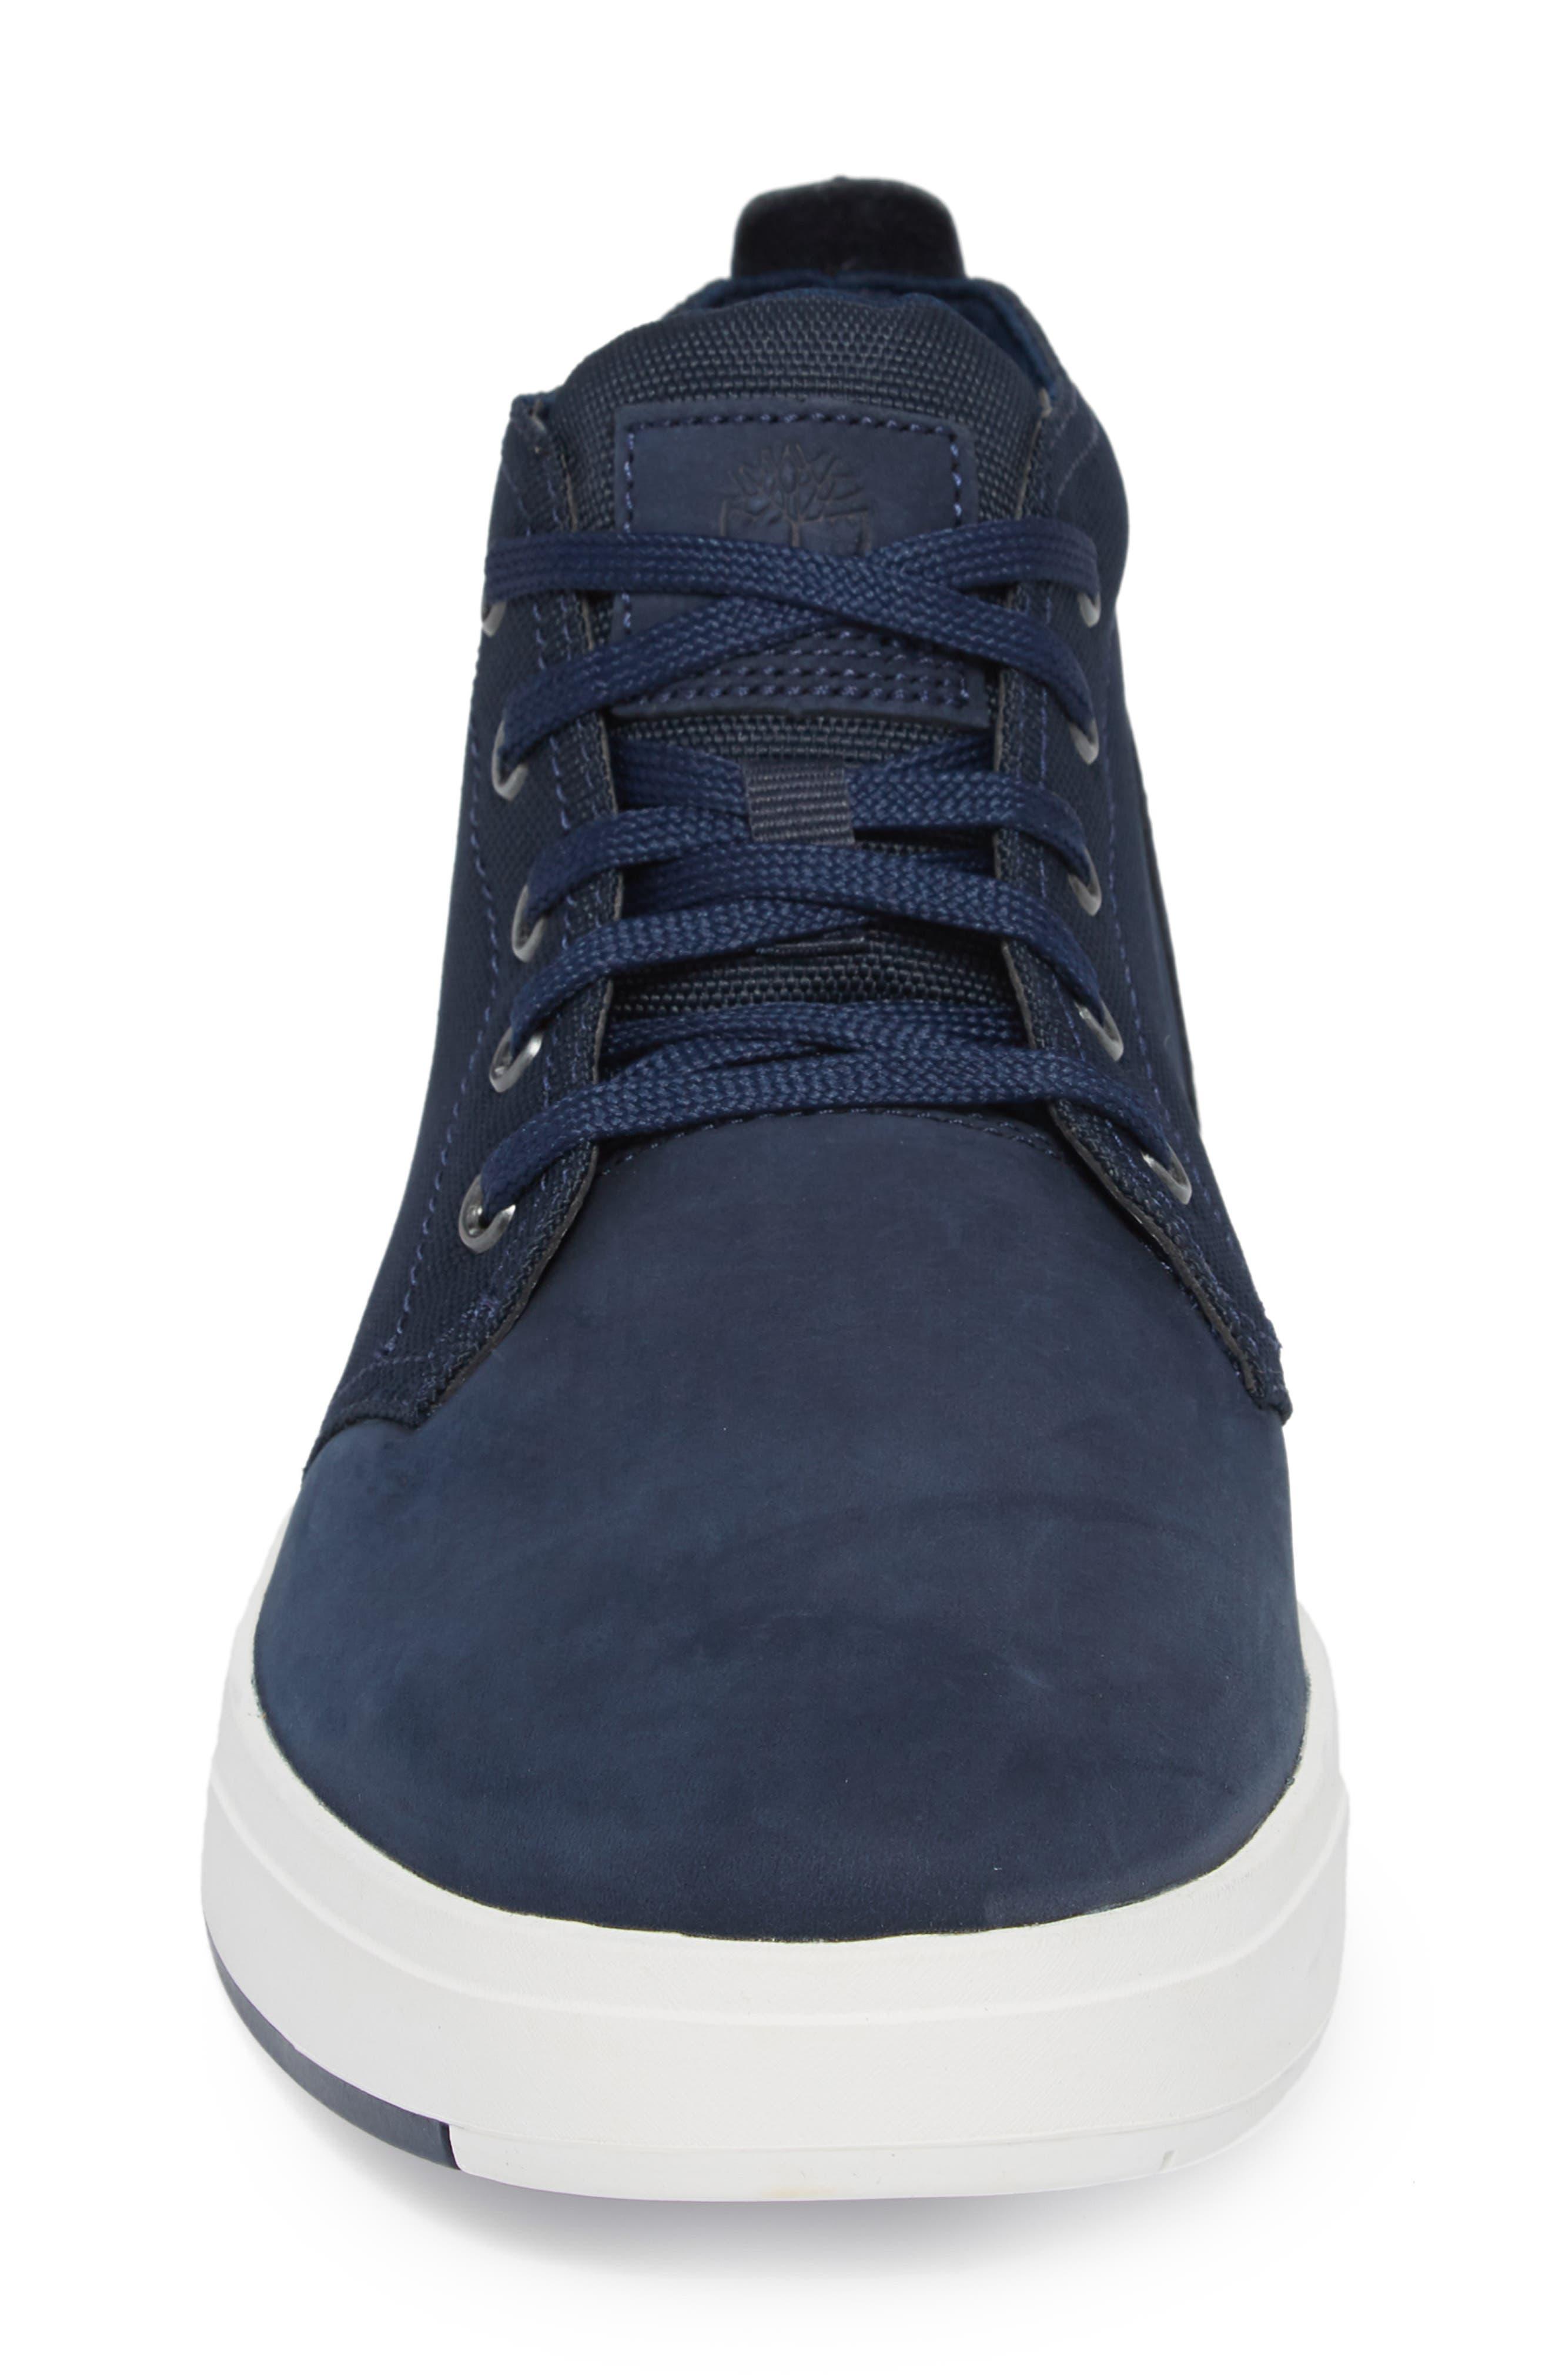 Davis Square Mid Top Sneaker,                             Alternate thumbnail 4, color,                             BLACK/ BLUE